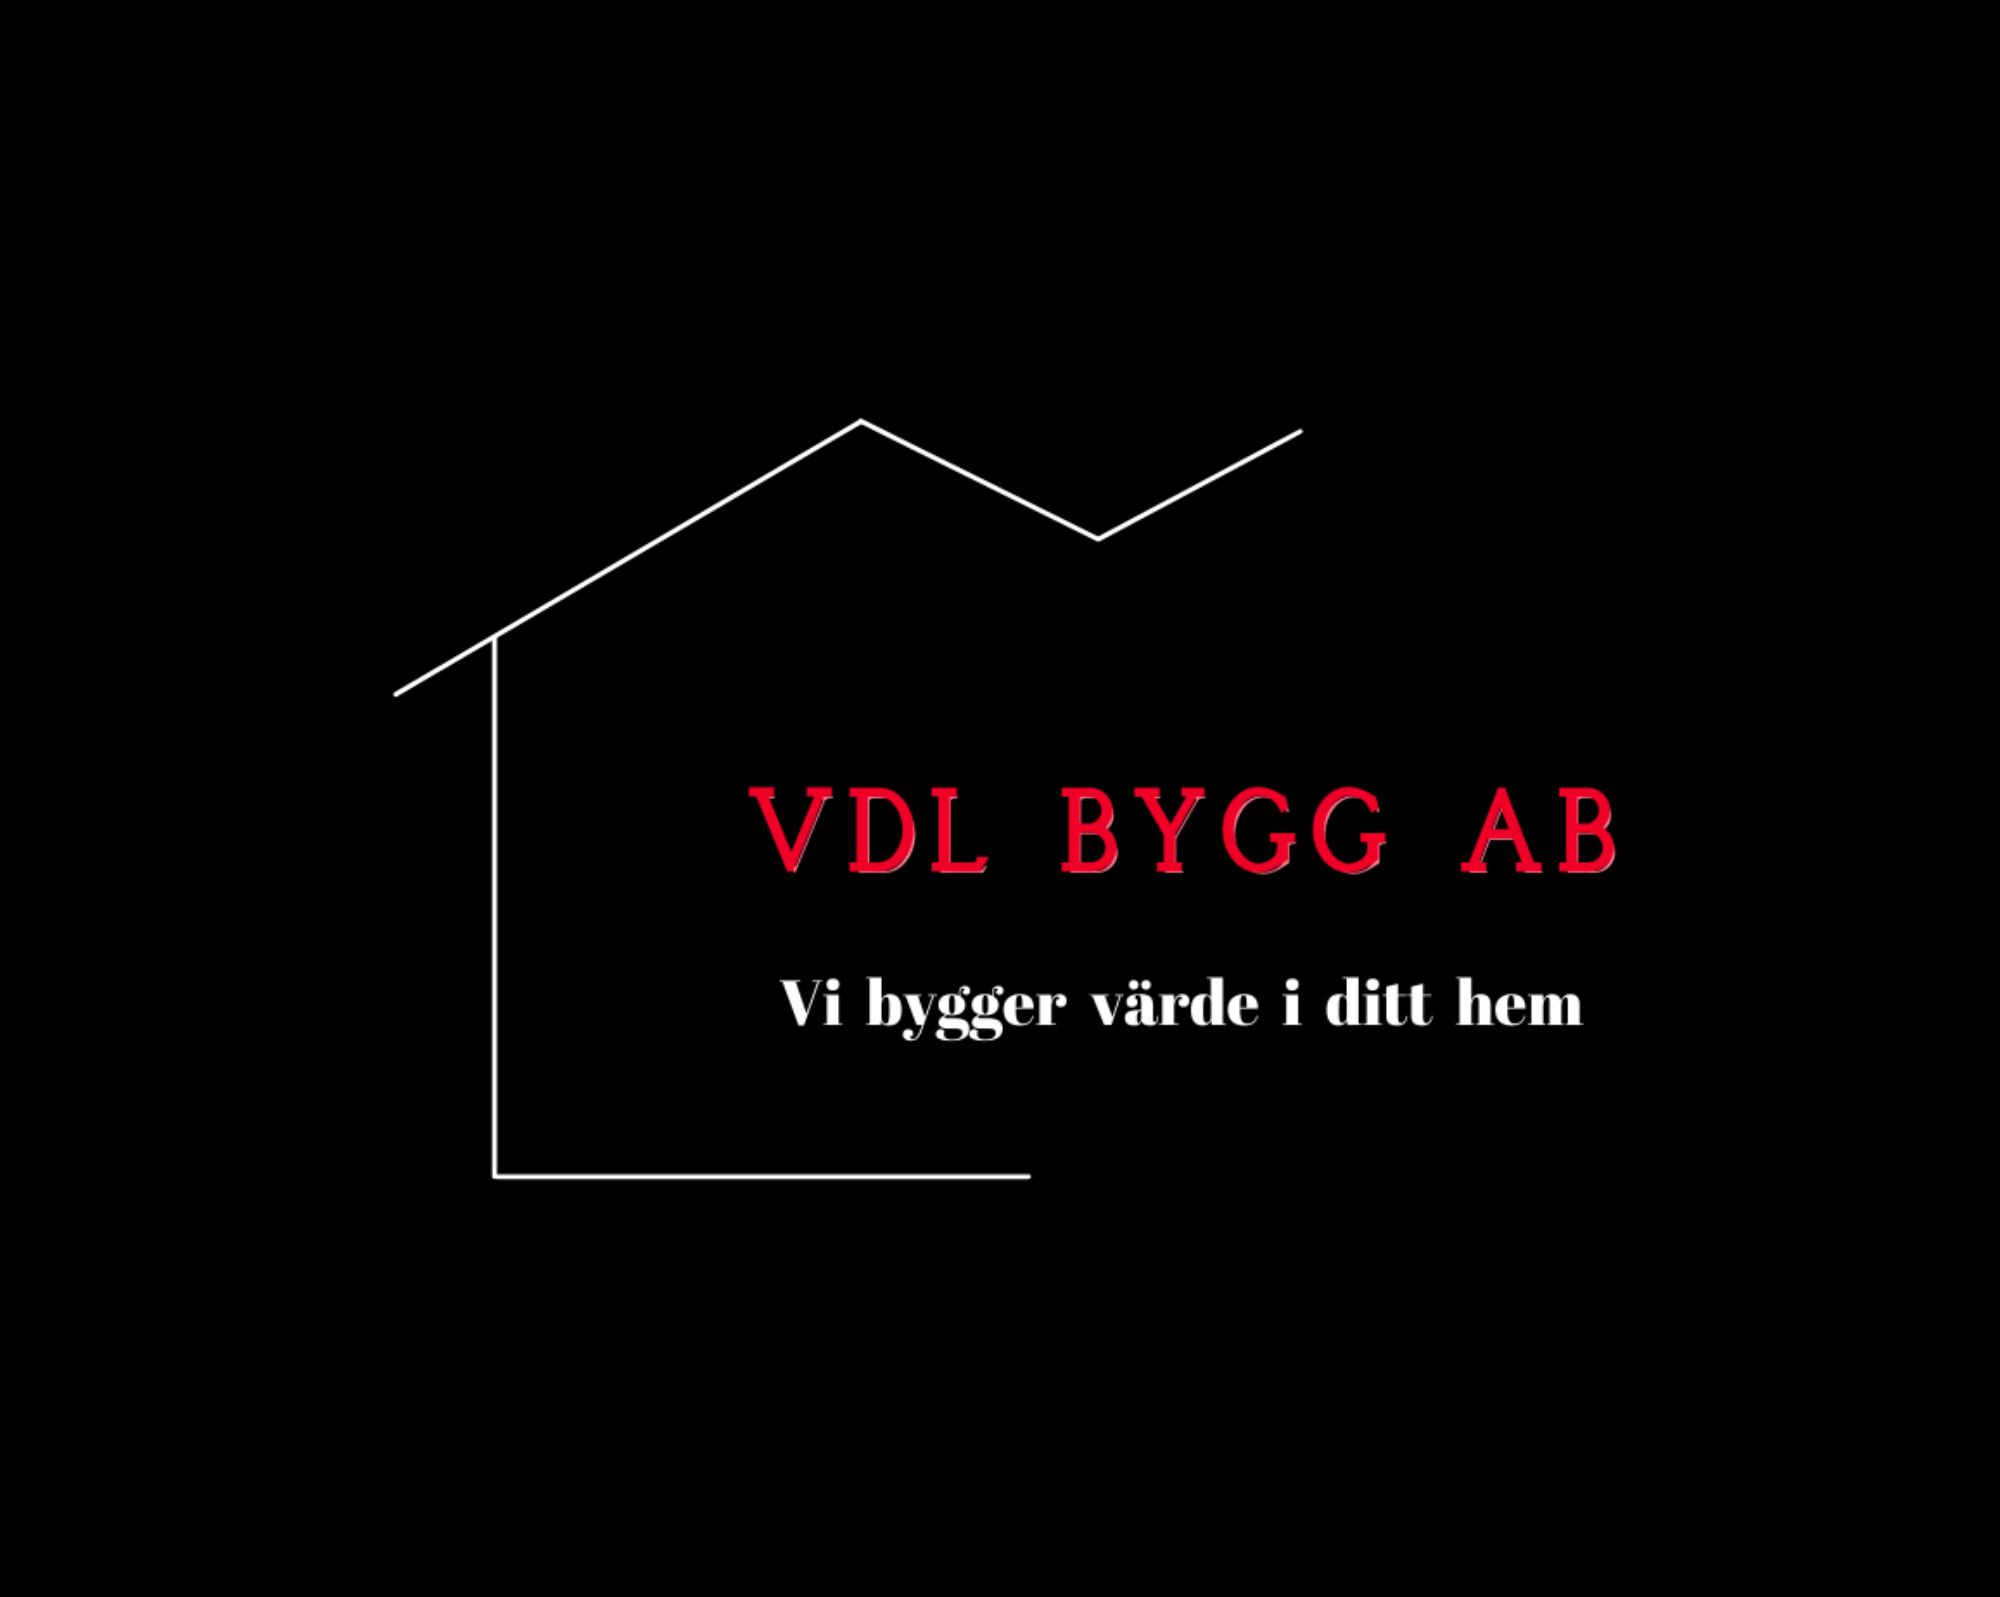 VDL BYGG AB